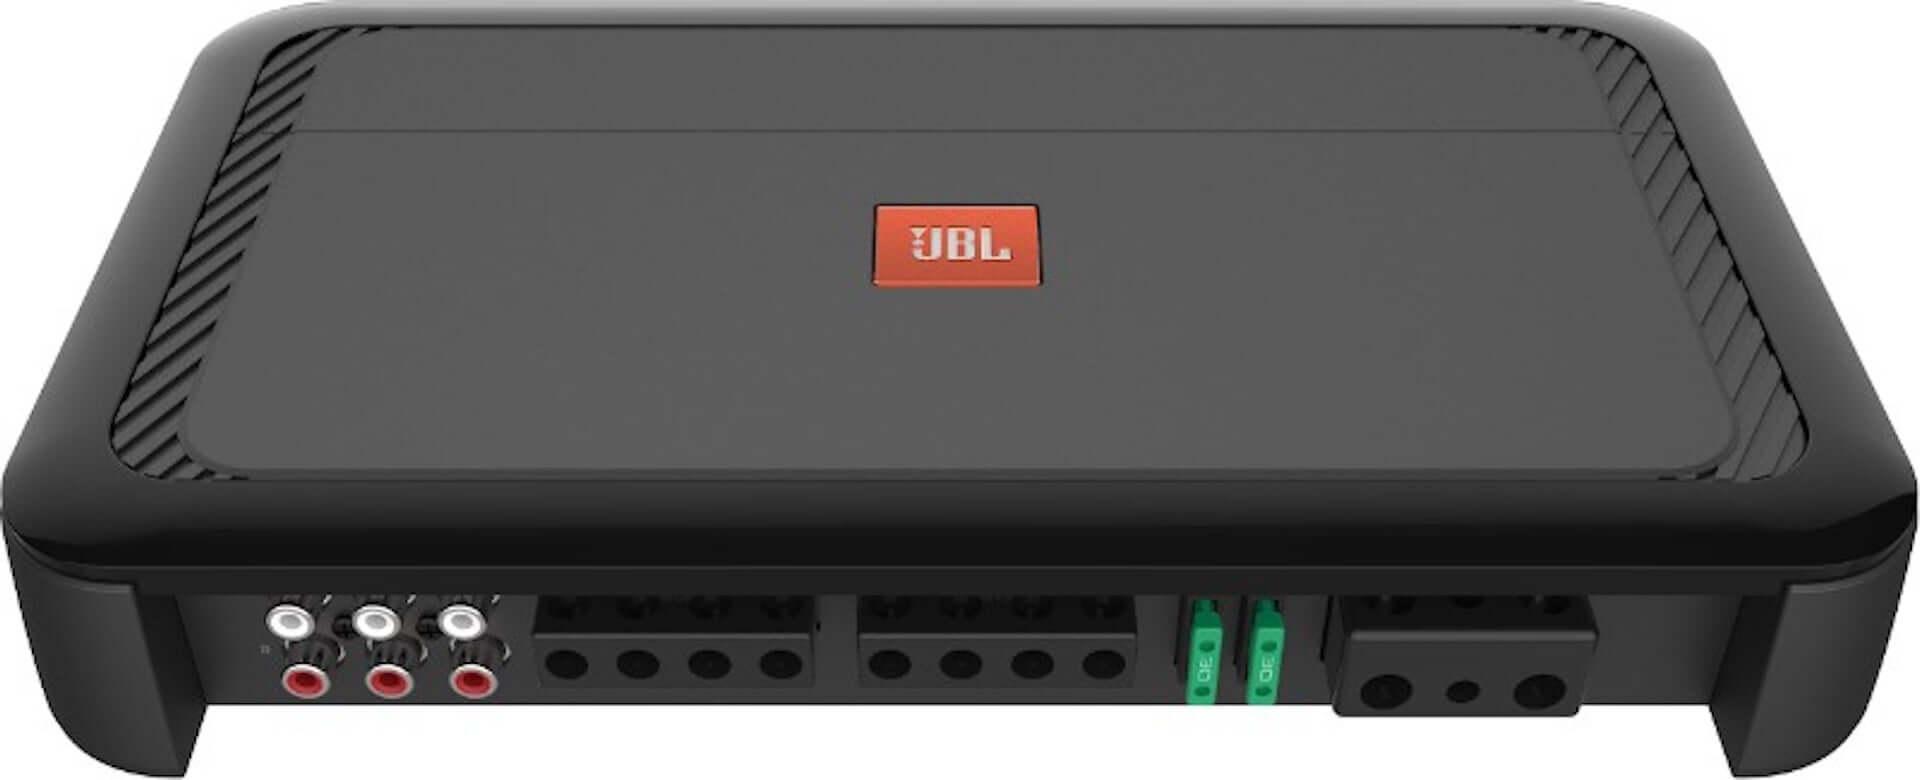 JBLのモバイルアンプでカーオーディオを手軽にアップグレード!「CLUB」シリーズから新モデルが発売決定 tech200327_jbl_club_5-1920x780